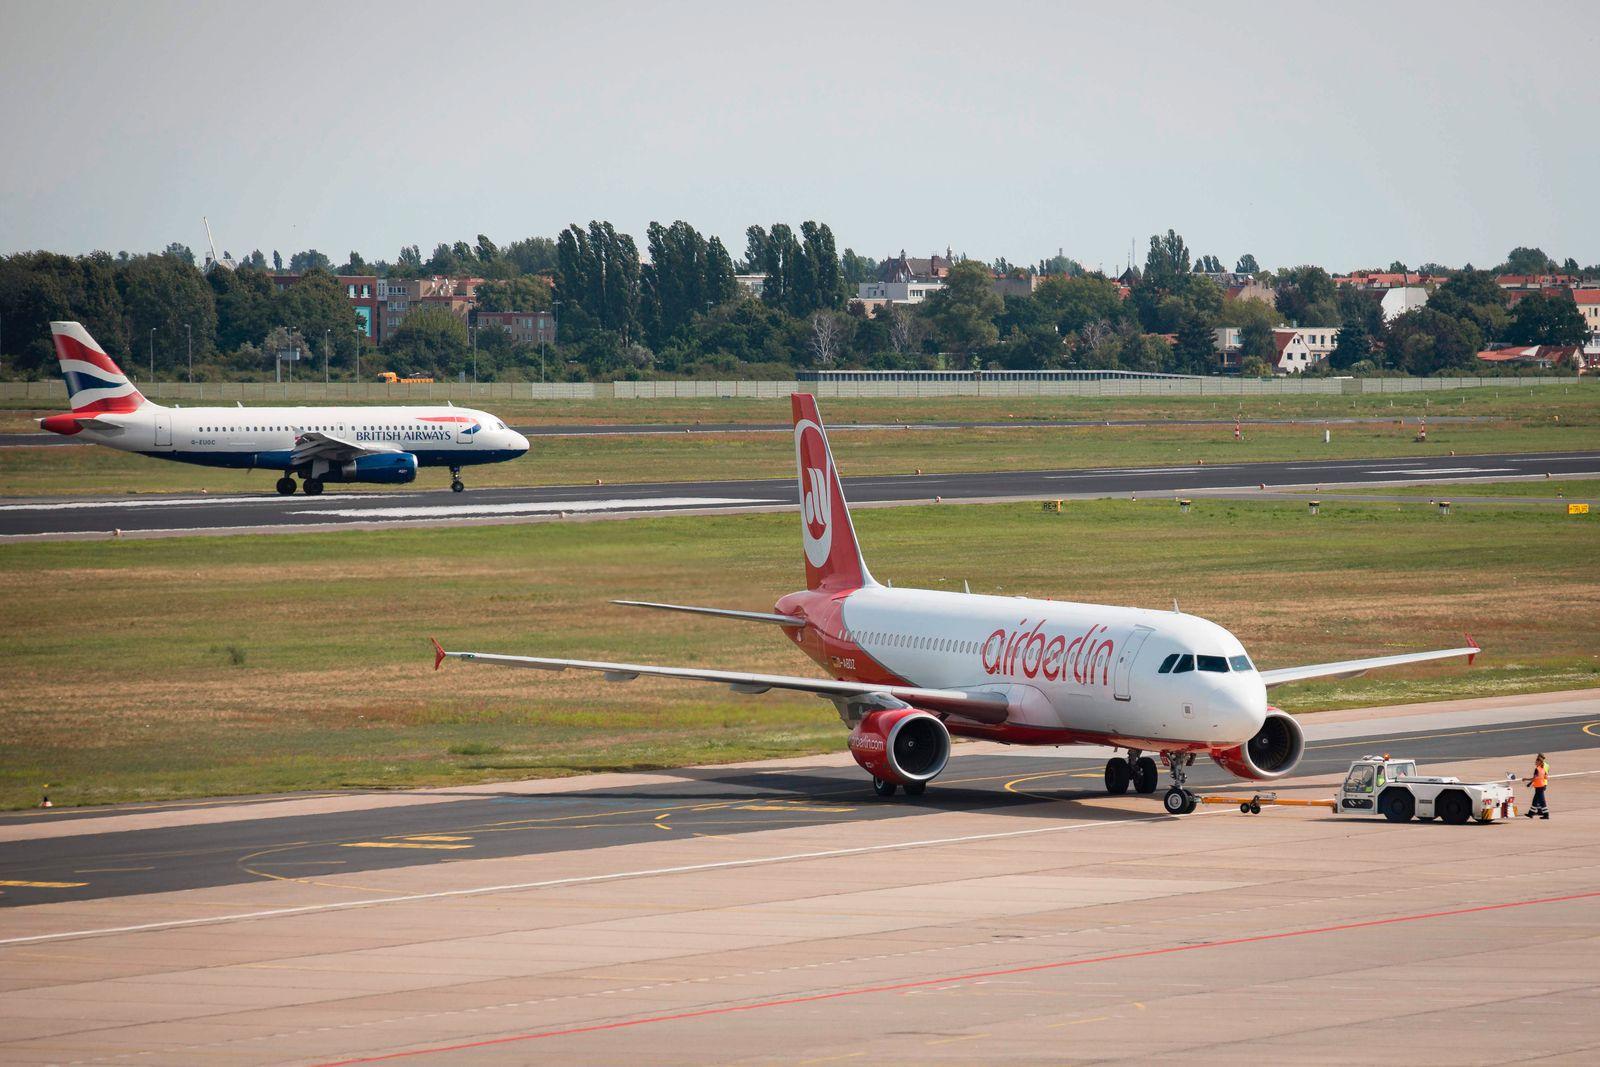 GERMANY-AIRPORT-TEGEL